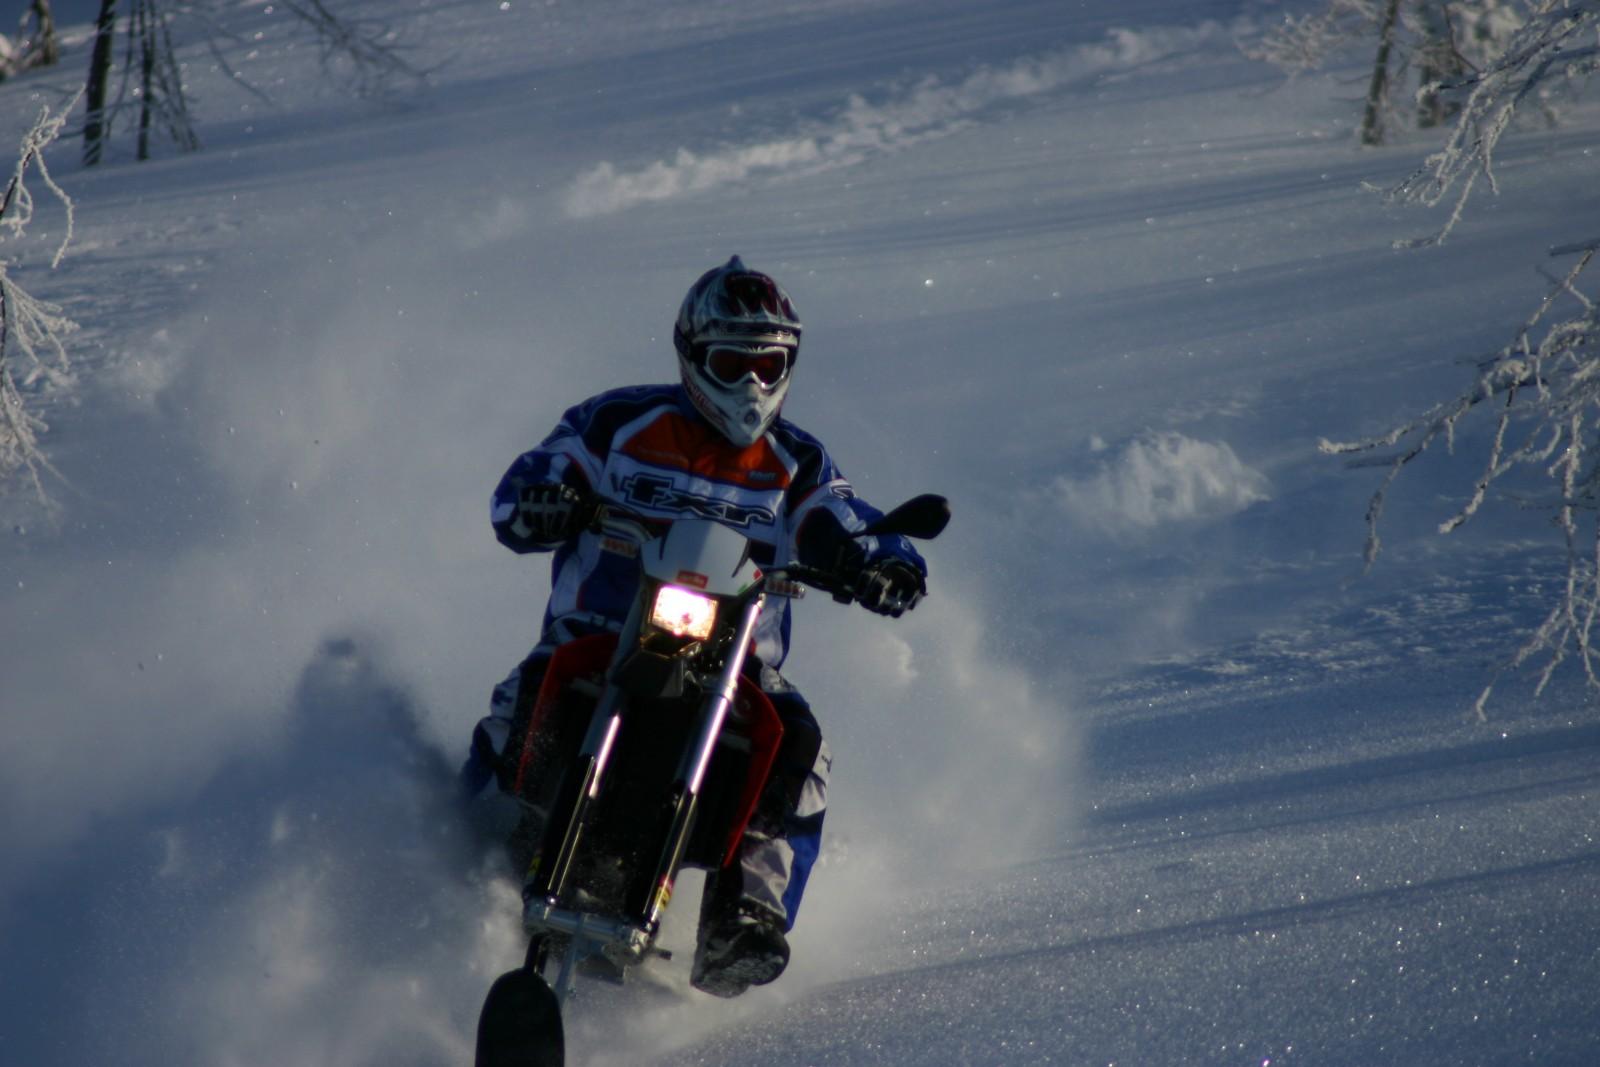 Explorer-snowbike-track-system-for-dirt-bike-supermoto-enduro-mx-AD-Boivin-113-1600x1067